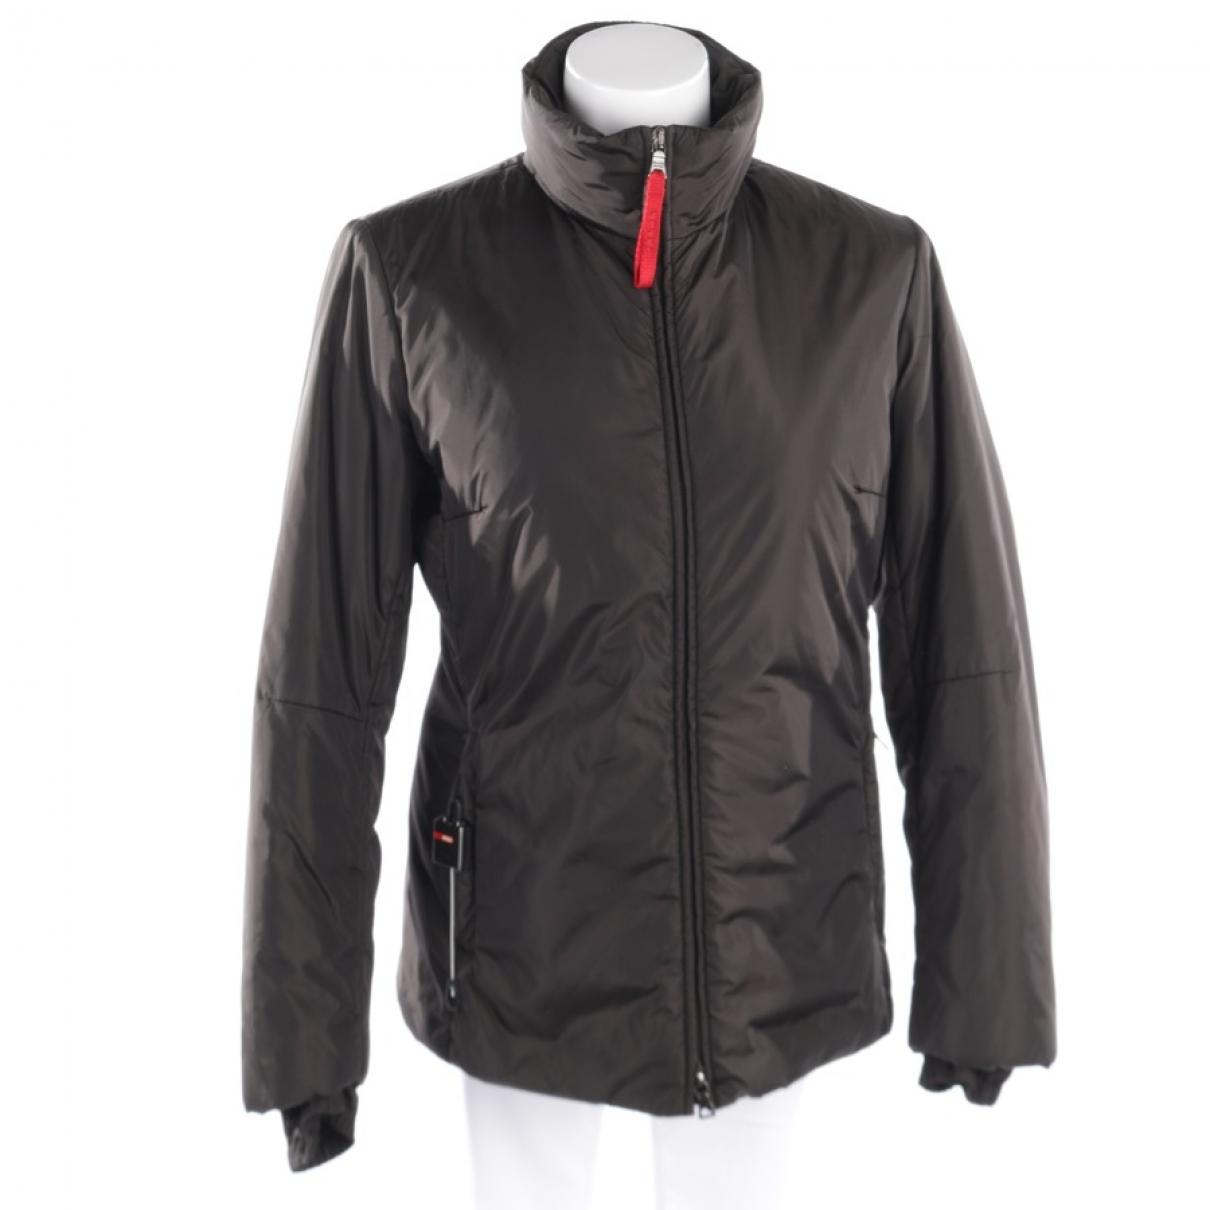 Prada \N Khaki jacket for Women 36 FR